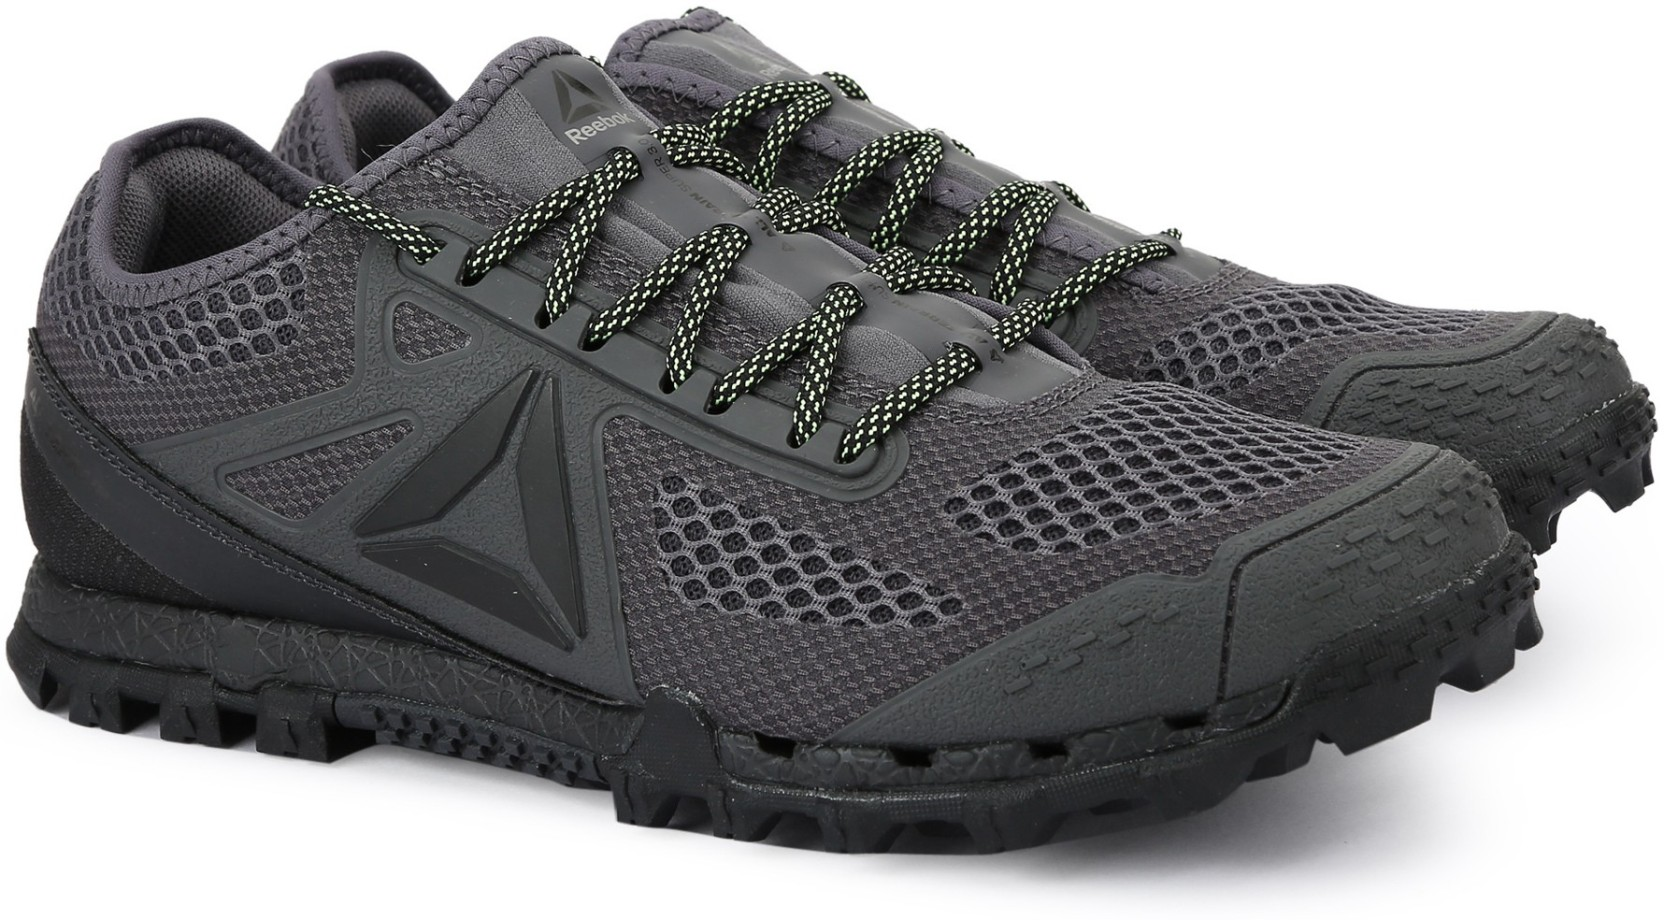 6884e6b2b85b REEBOK ALL TERRAIN SUPER 3.0 Running Shoes For Men - Buy GRY BLK ...